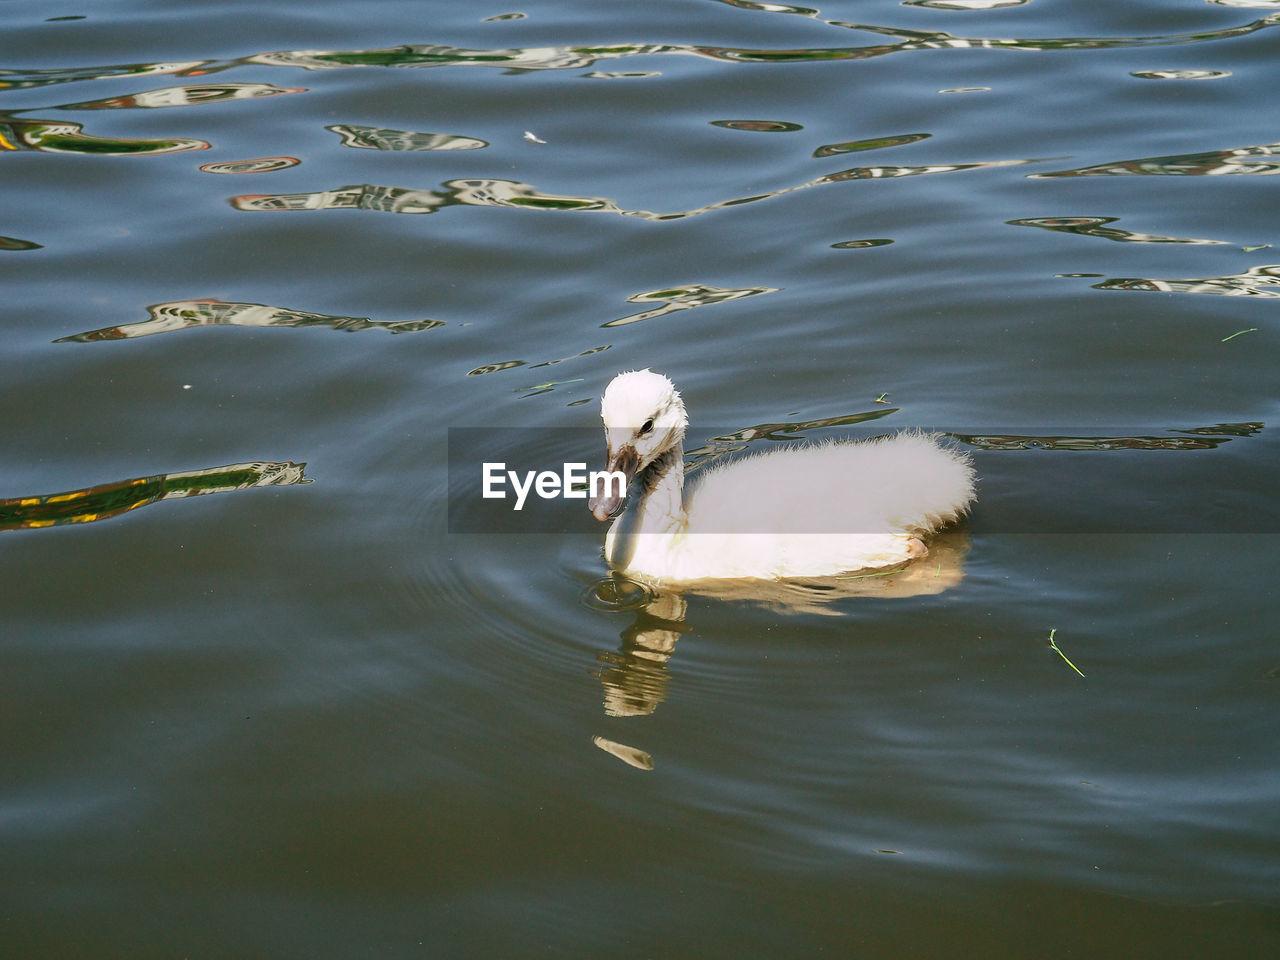 Close-Up Of Cygnet Swimming At Lake